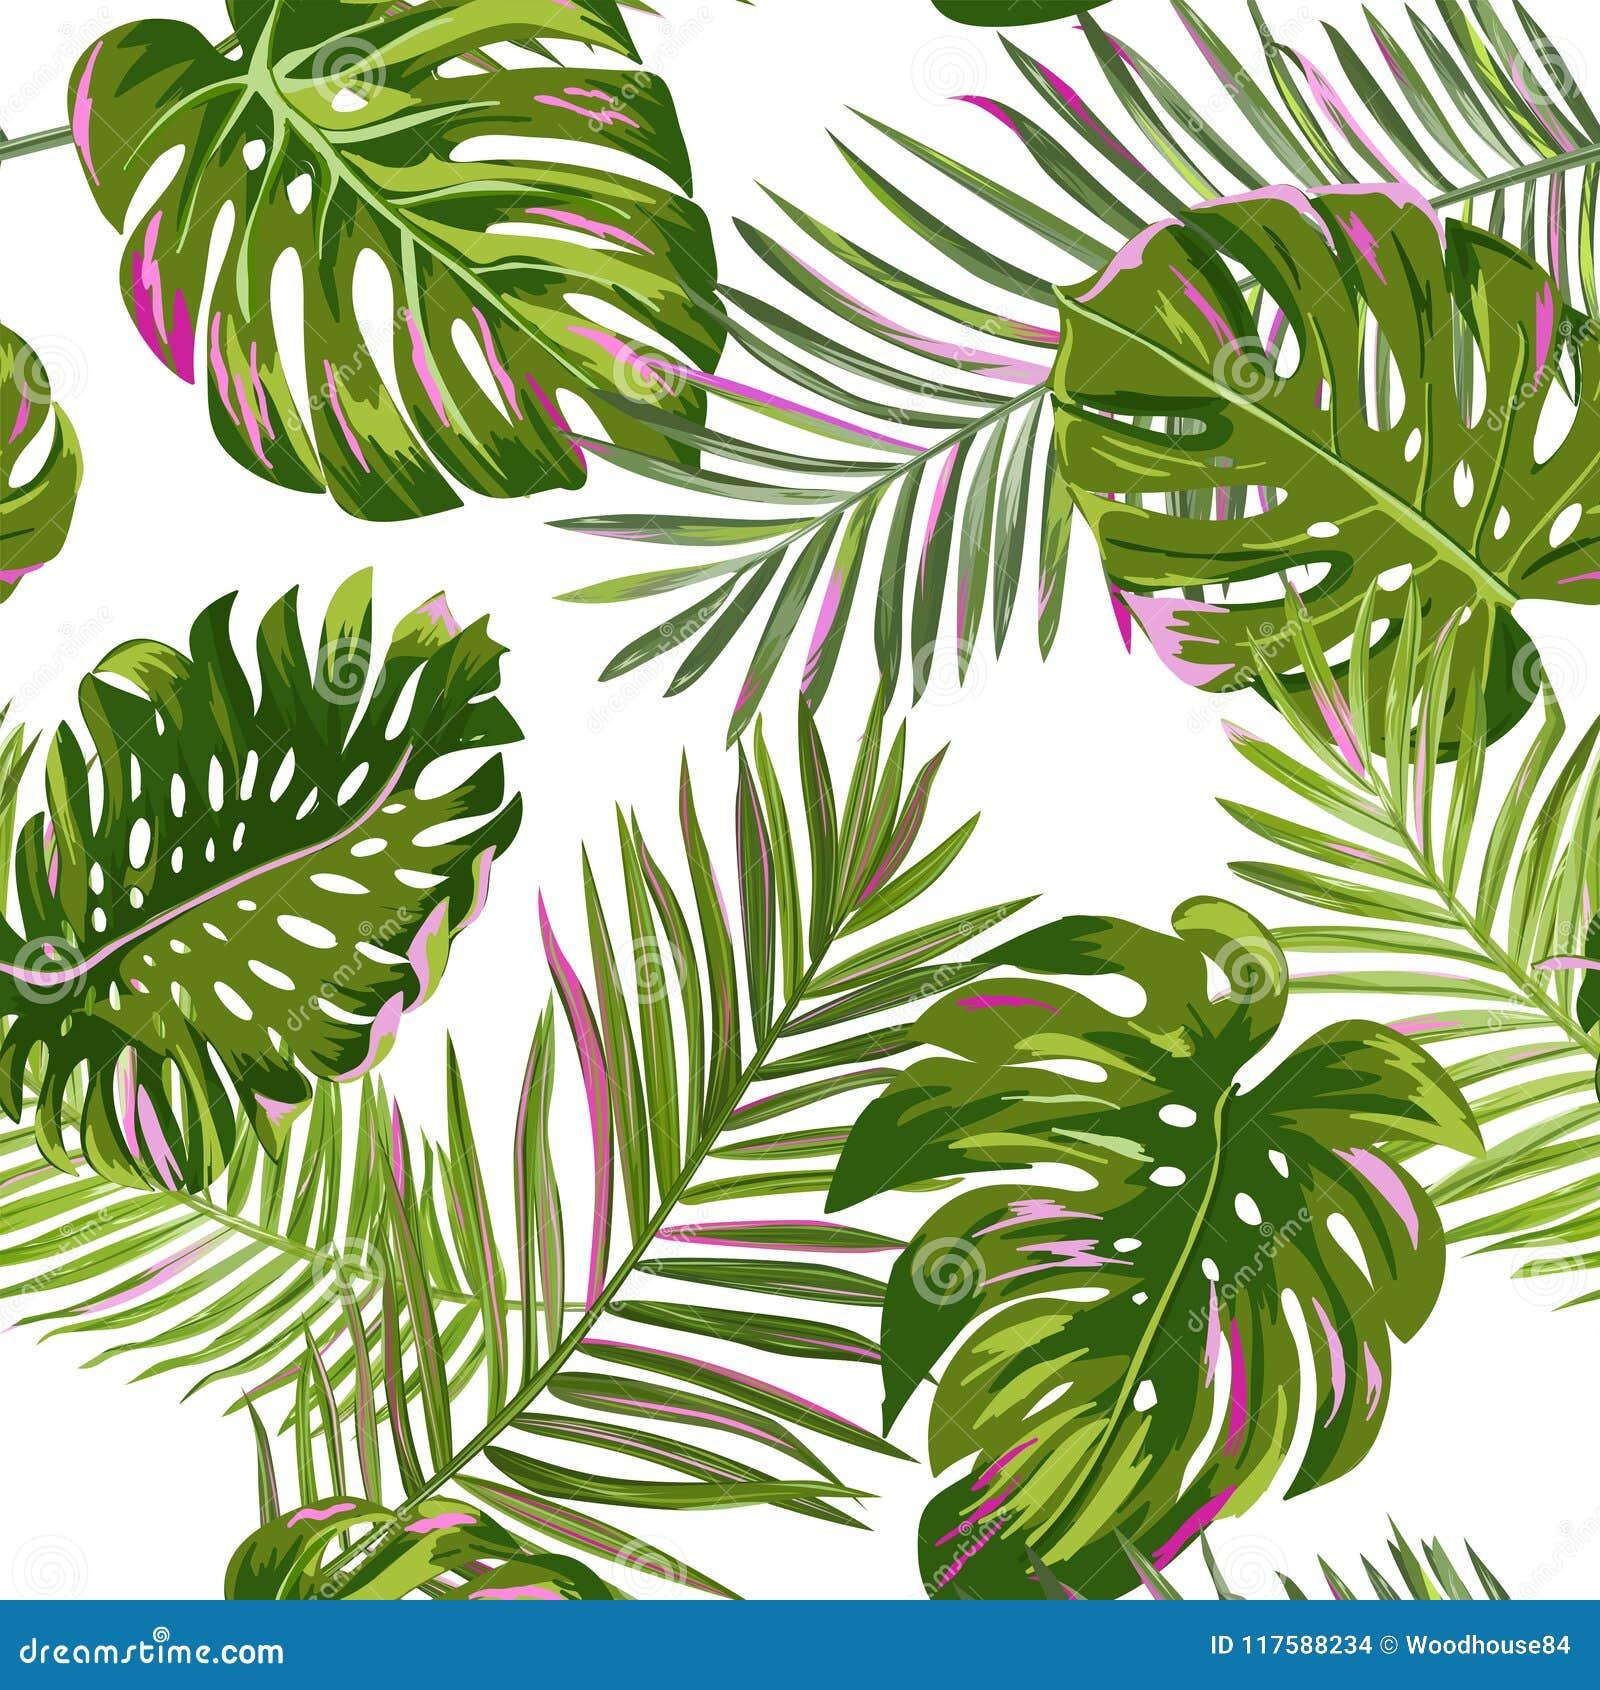 Modelo inconsútil de las hojas de palma tropicales Fondo floral de la acuarela Diseño botánico exótico para la tela, materia text